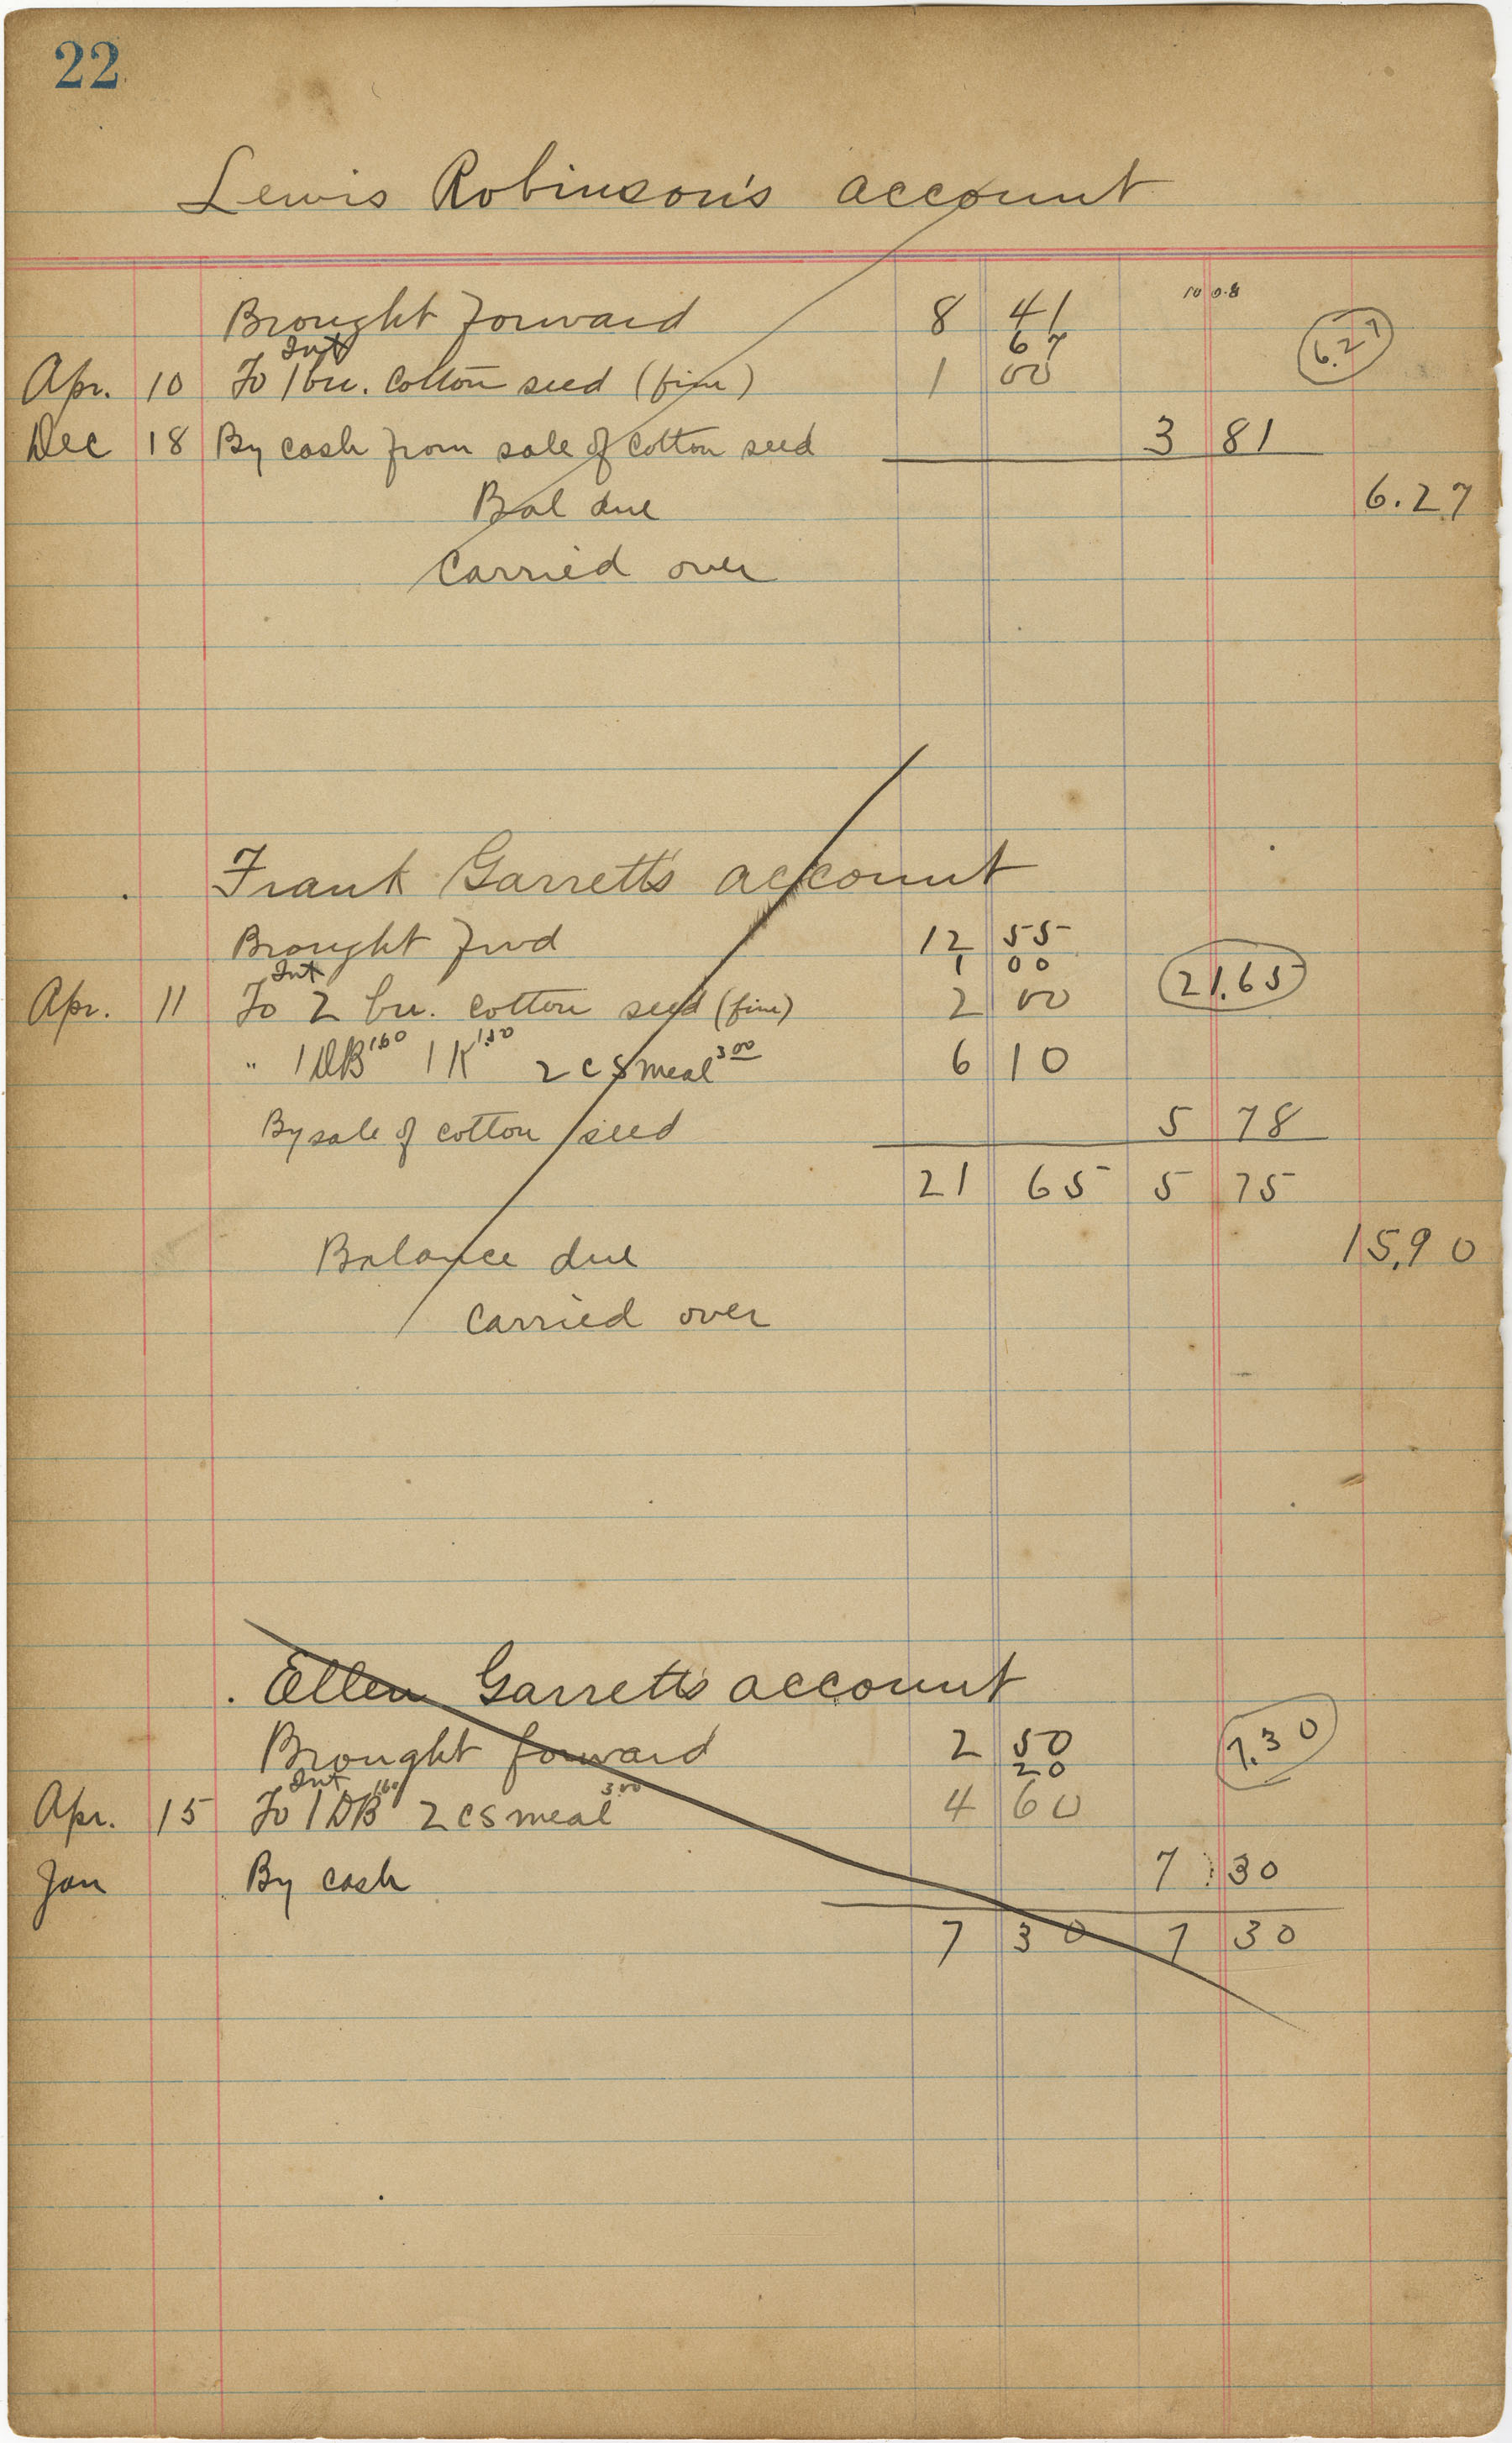 McLeod Plantation Journal, Page 41